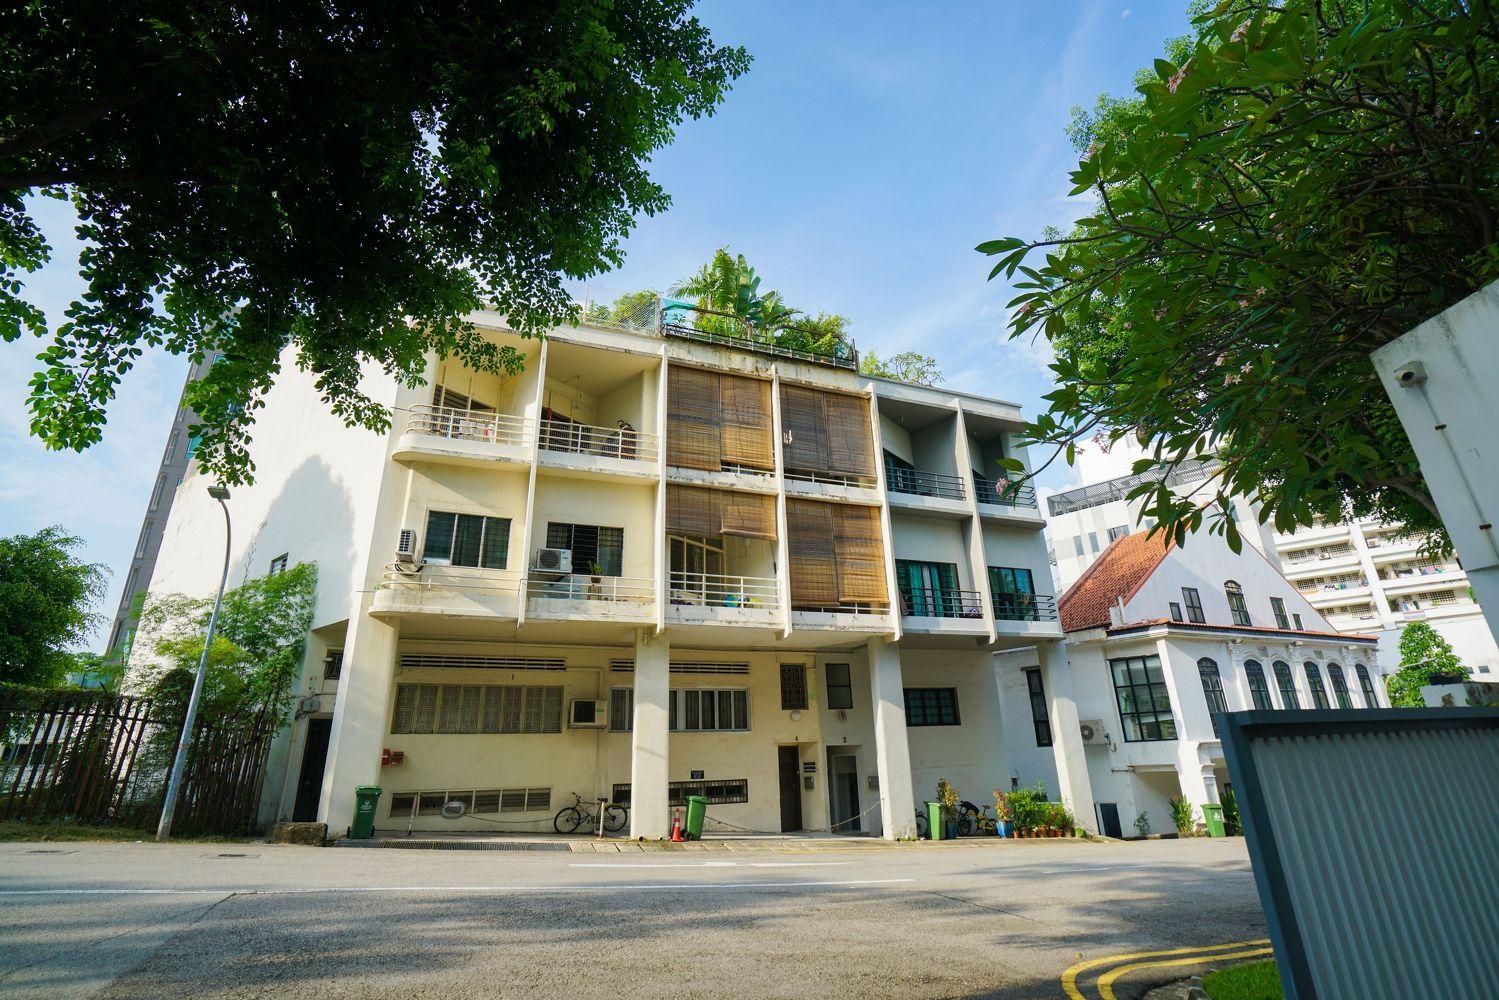 Mt-Emily-Rd - EDGEPROP SINGAPORE